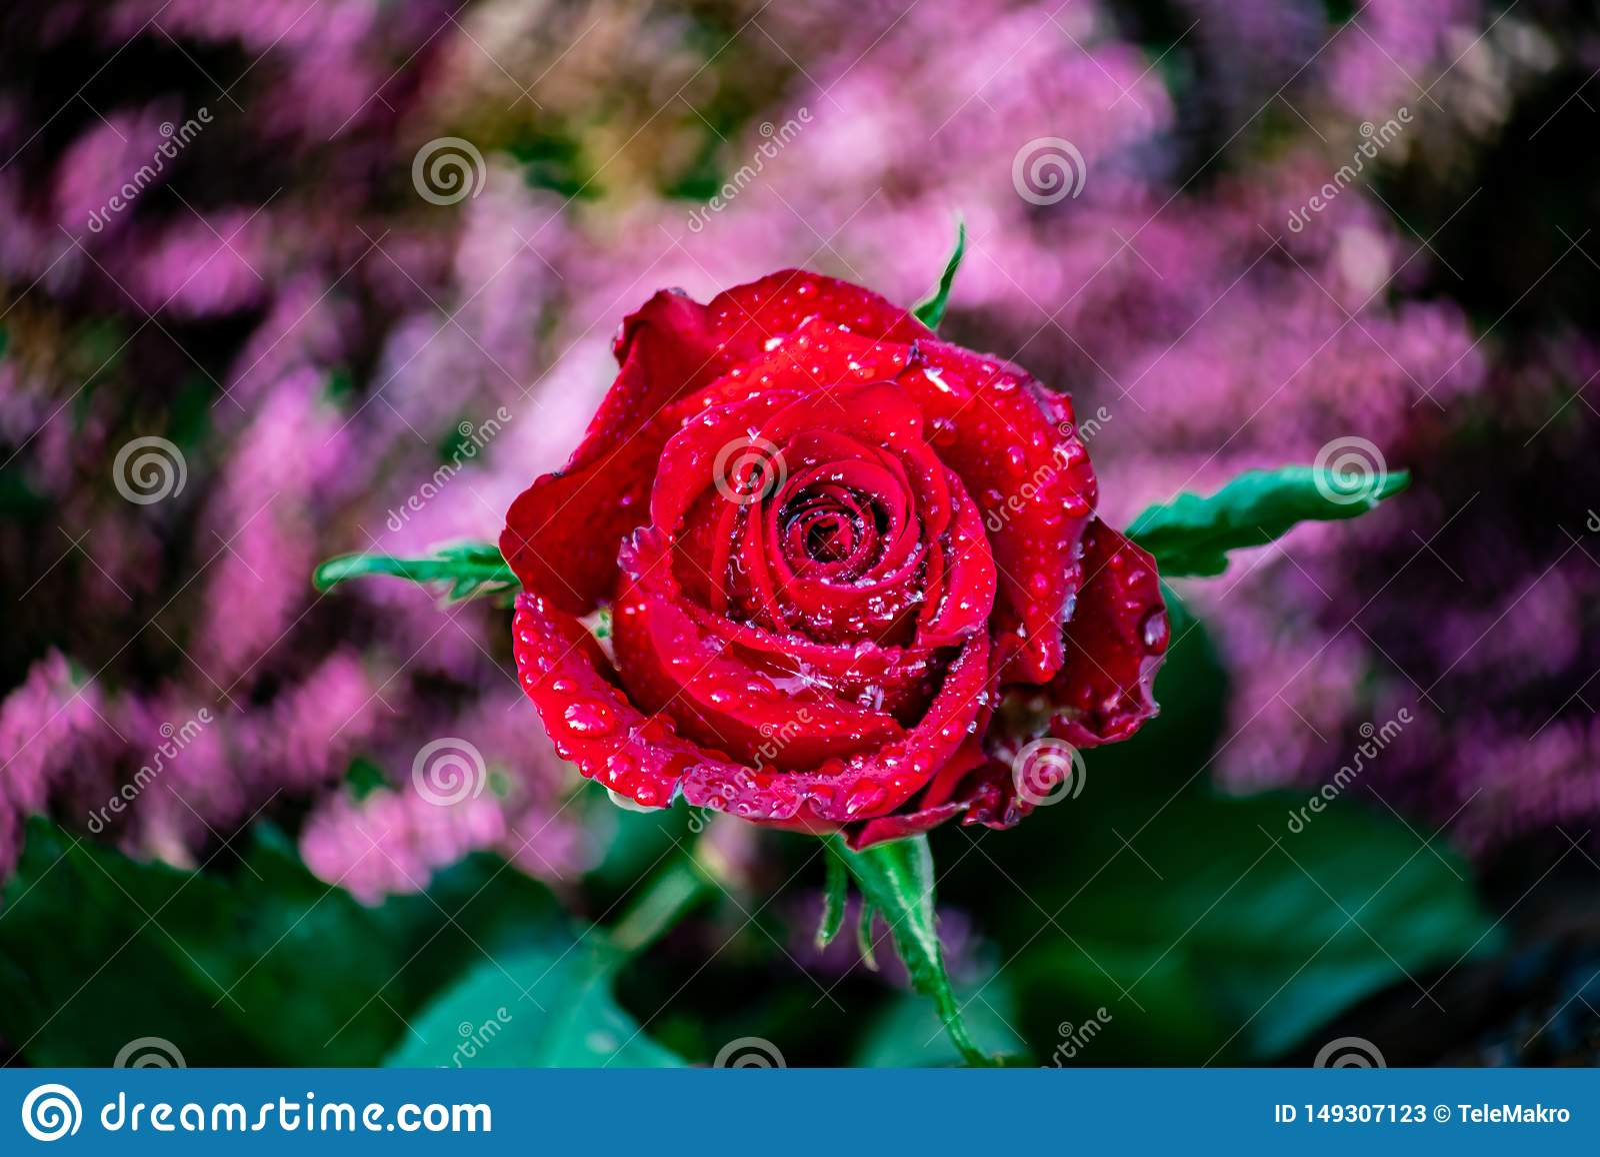 Rosa vermelha com waterdrops brilhantes